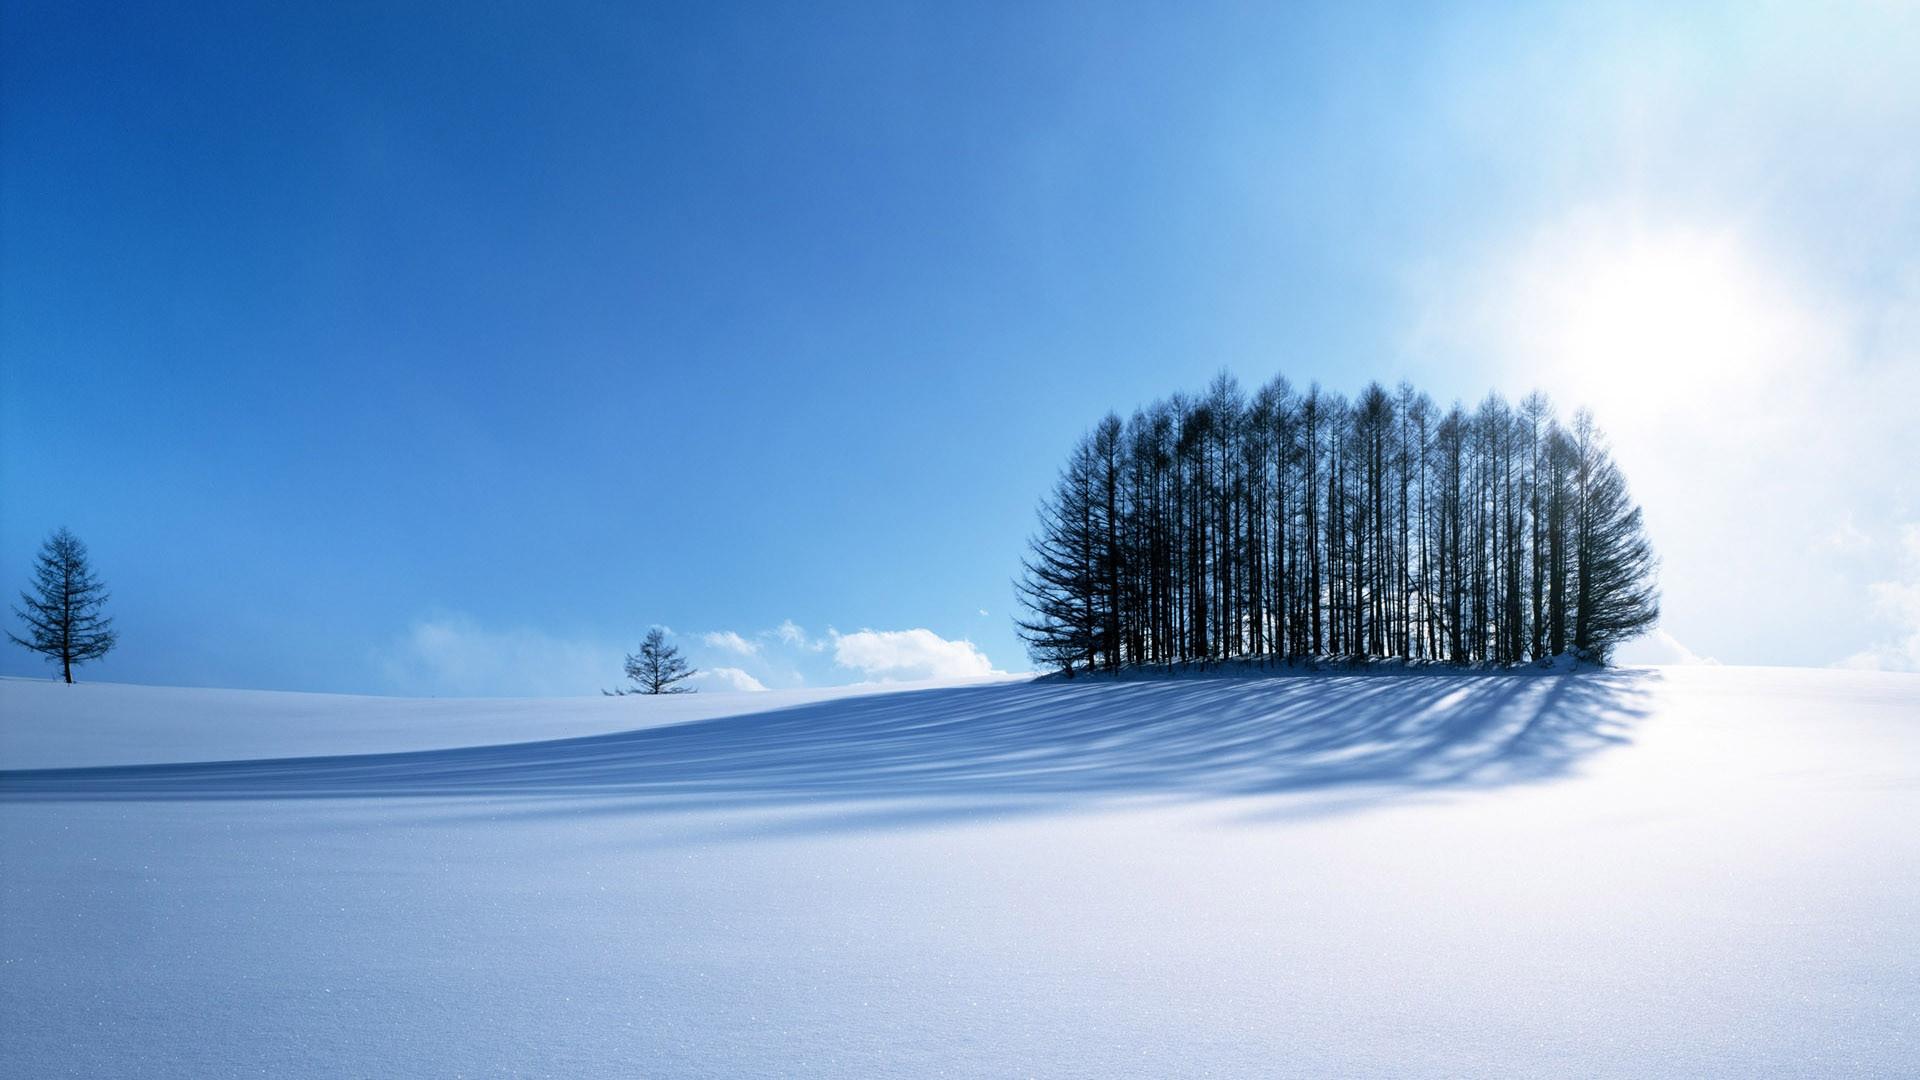 ws_Winter_1920x1080 (1).jpg